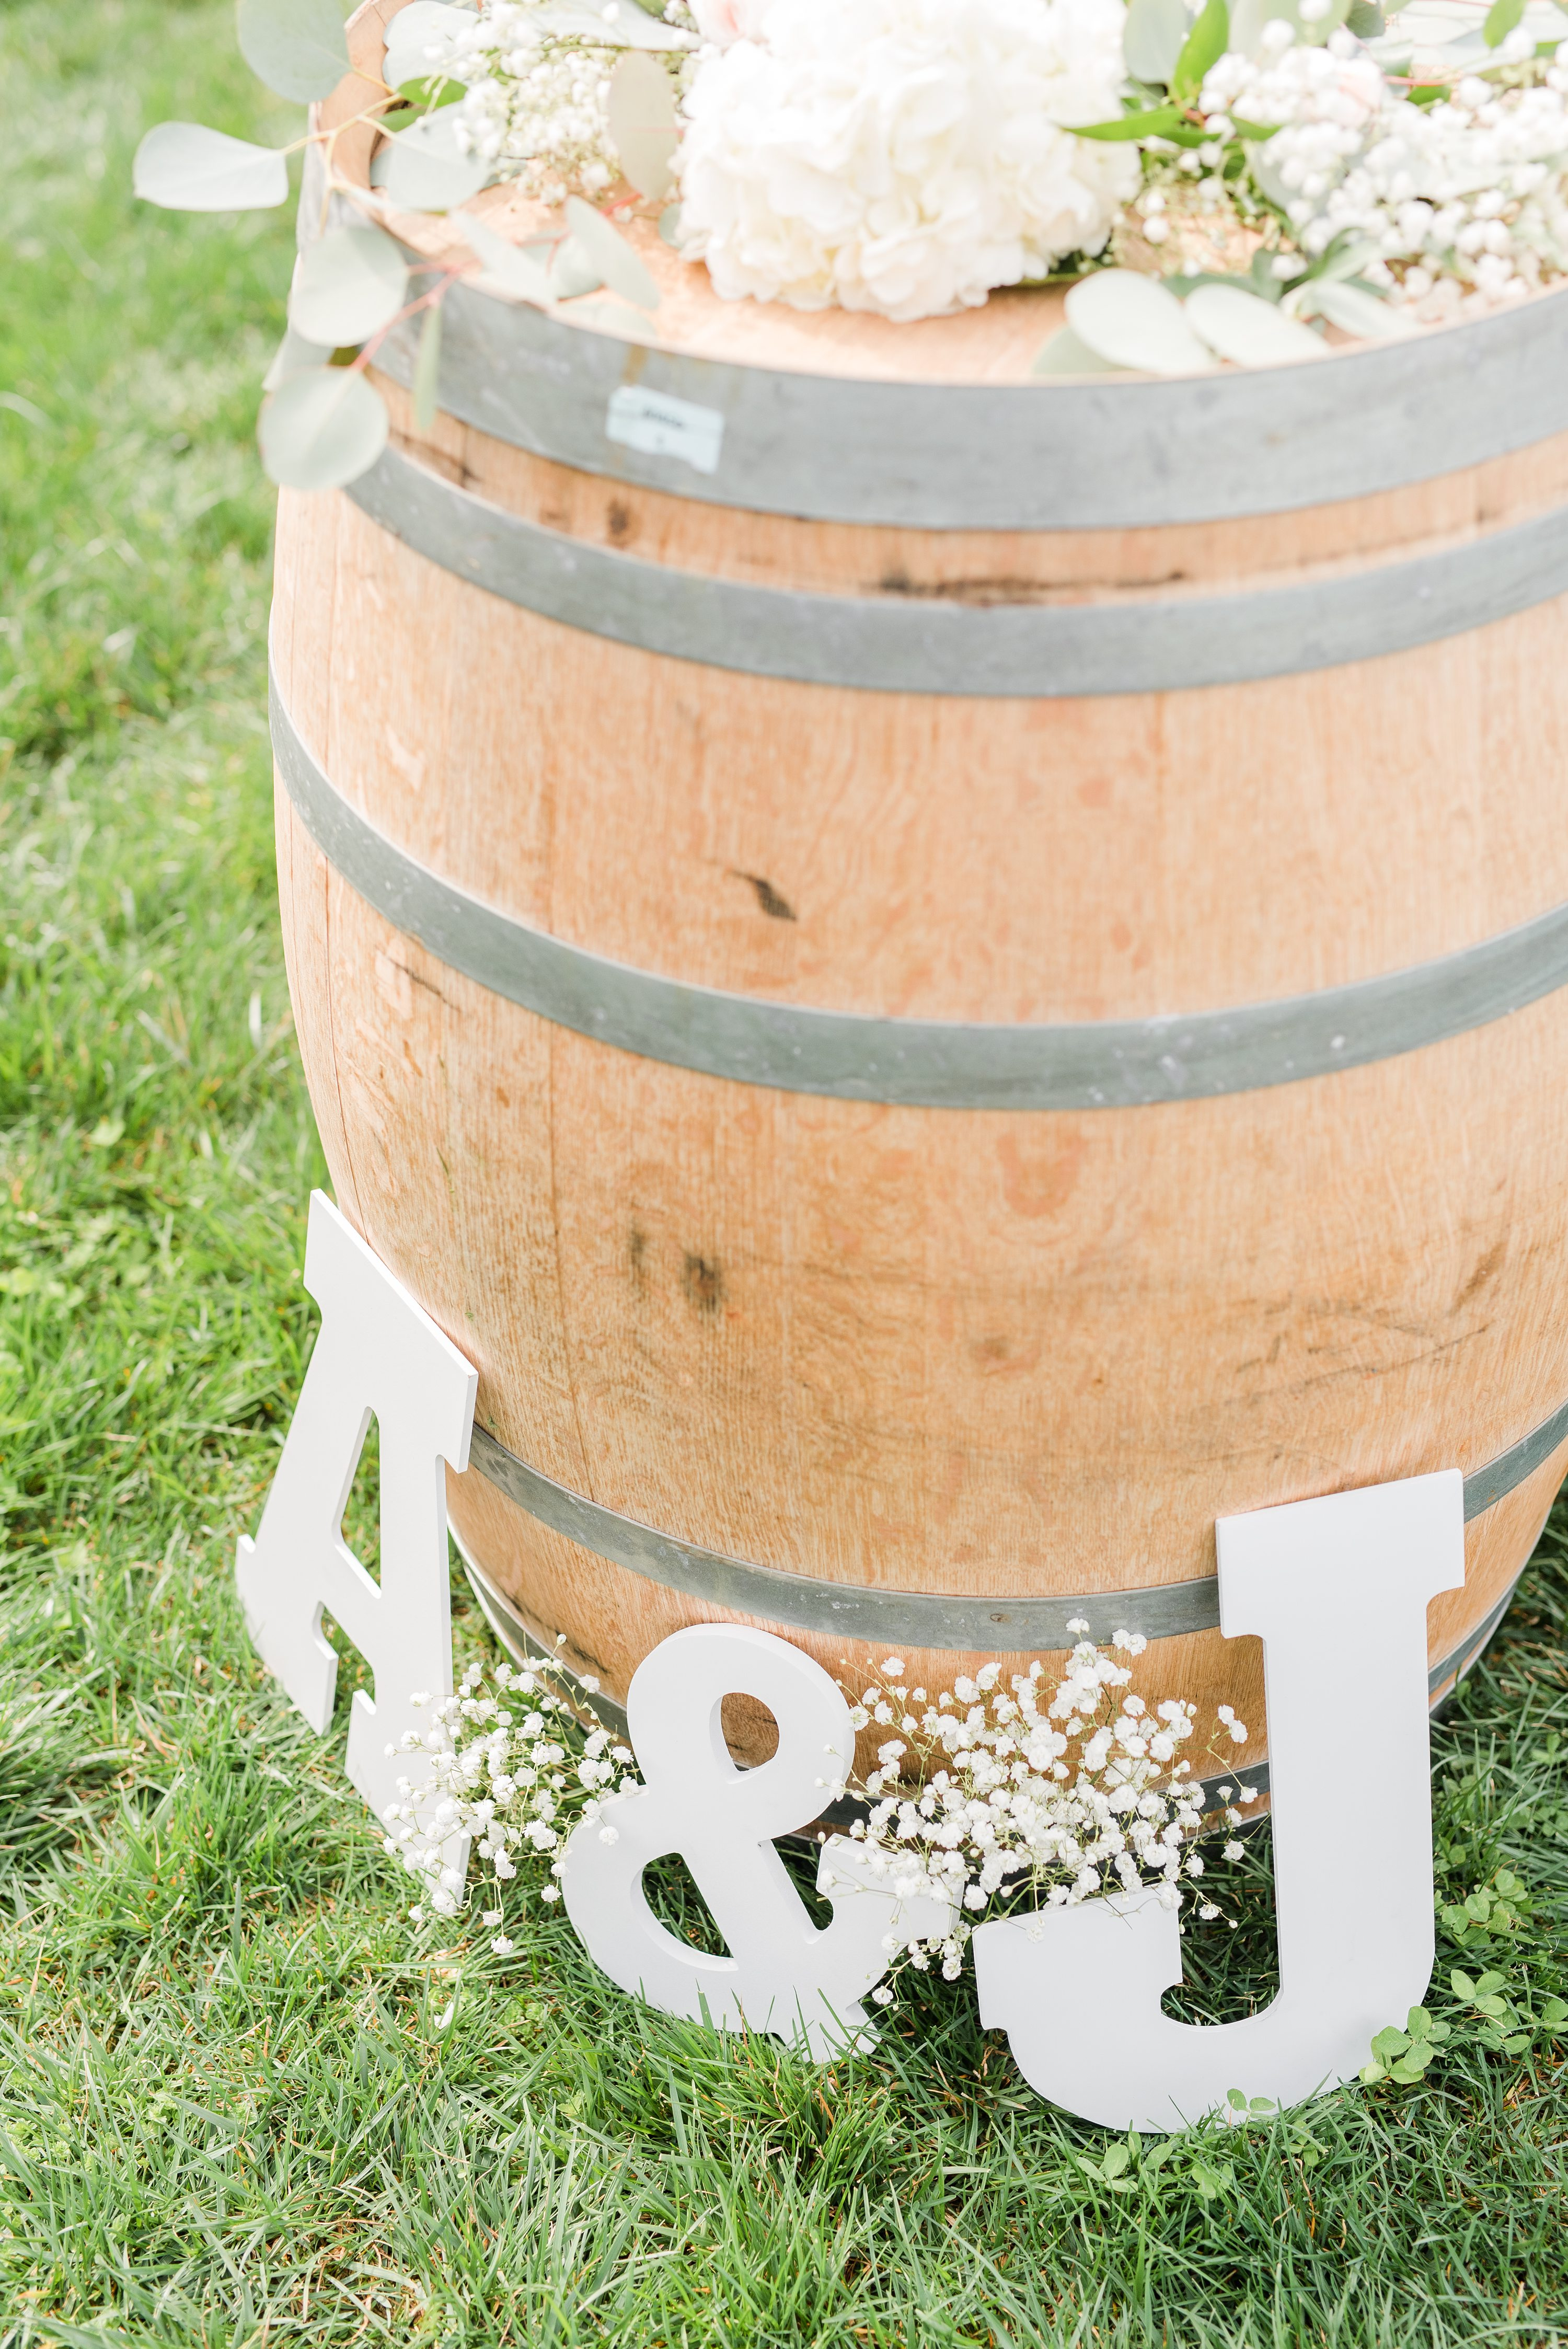 Edgewood,Charlottesville Wedding Photographer,ceremony details,personalized wedding,baby's breath